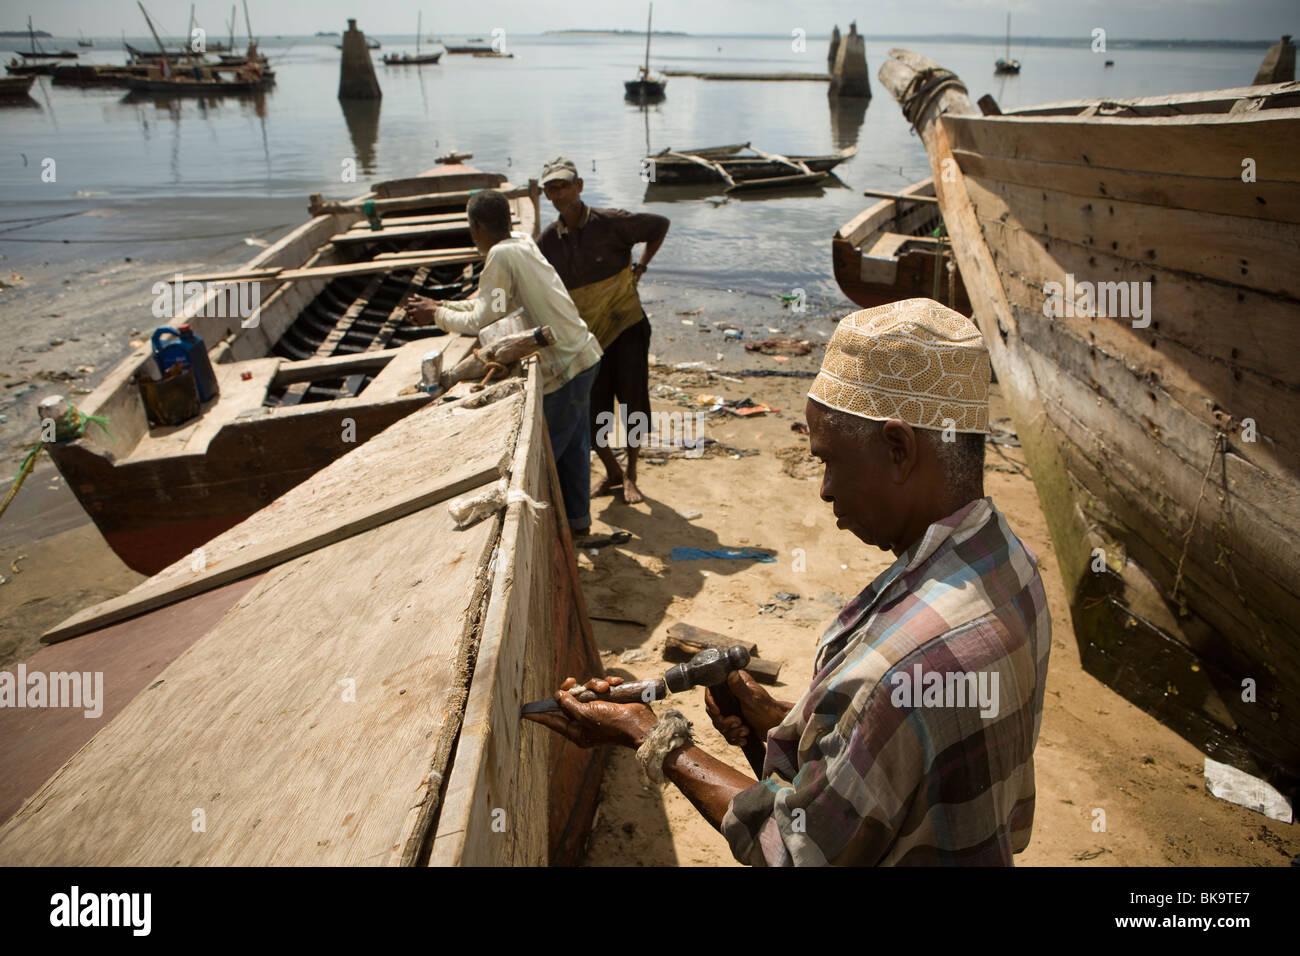 Shipyard - Stonetown, Zanzibar, Tanzanie. Banque D'Images